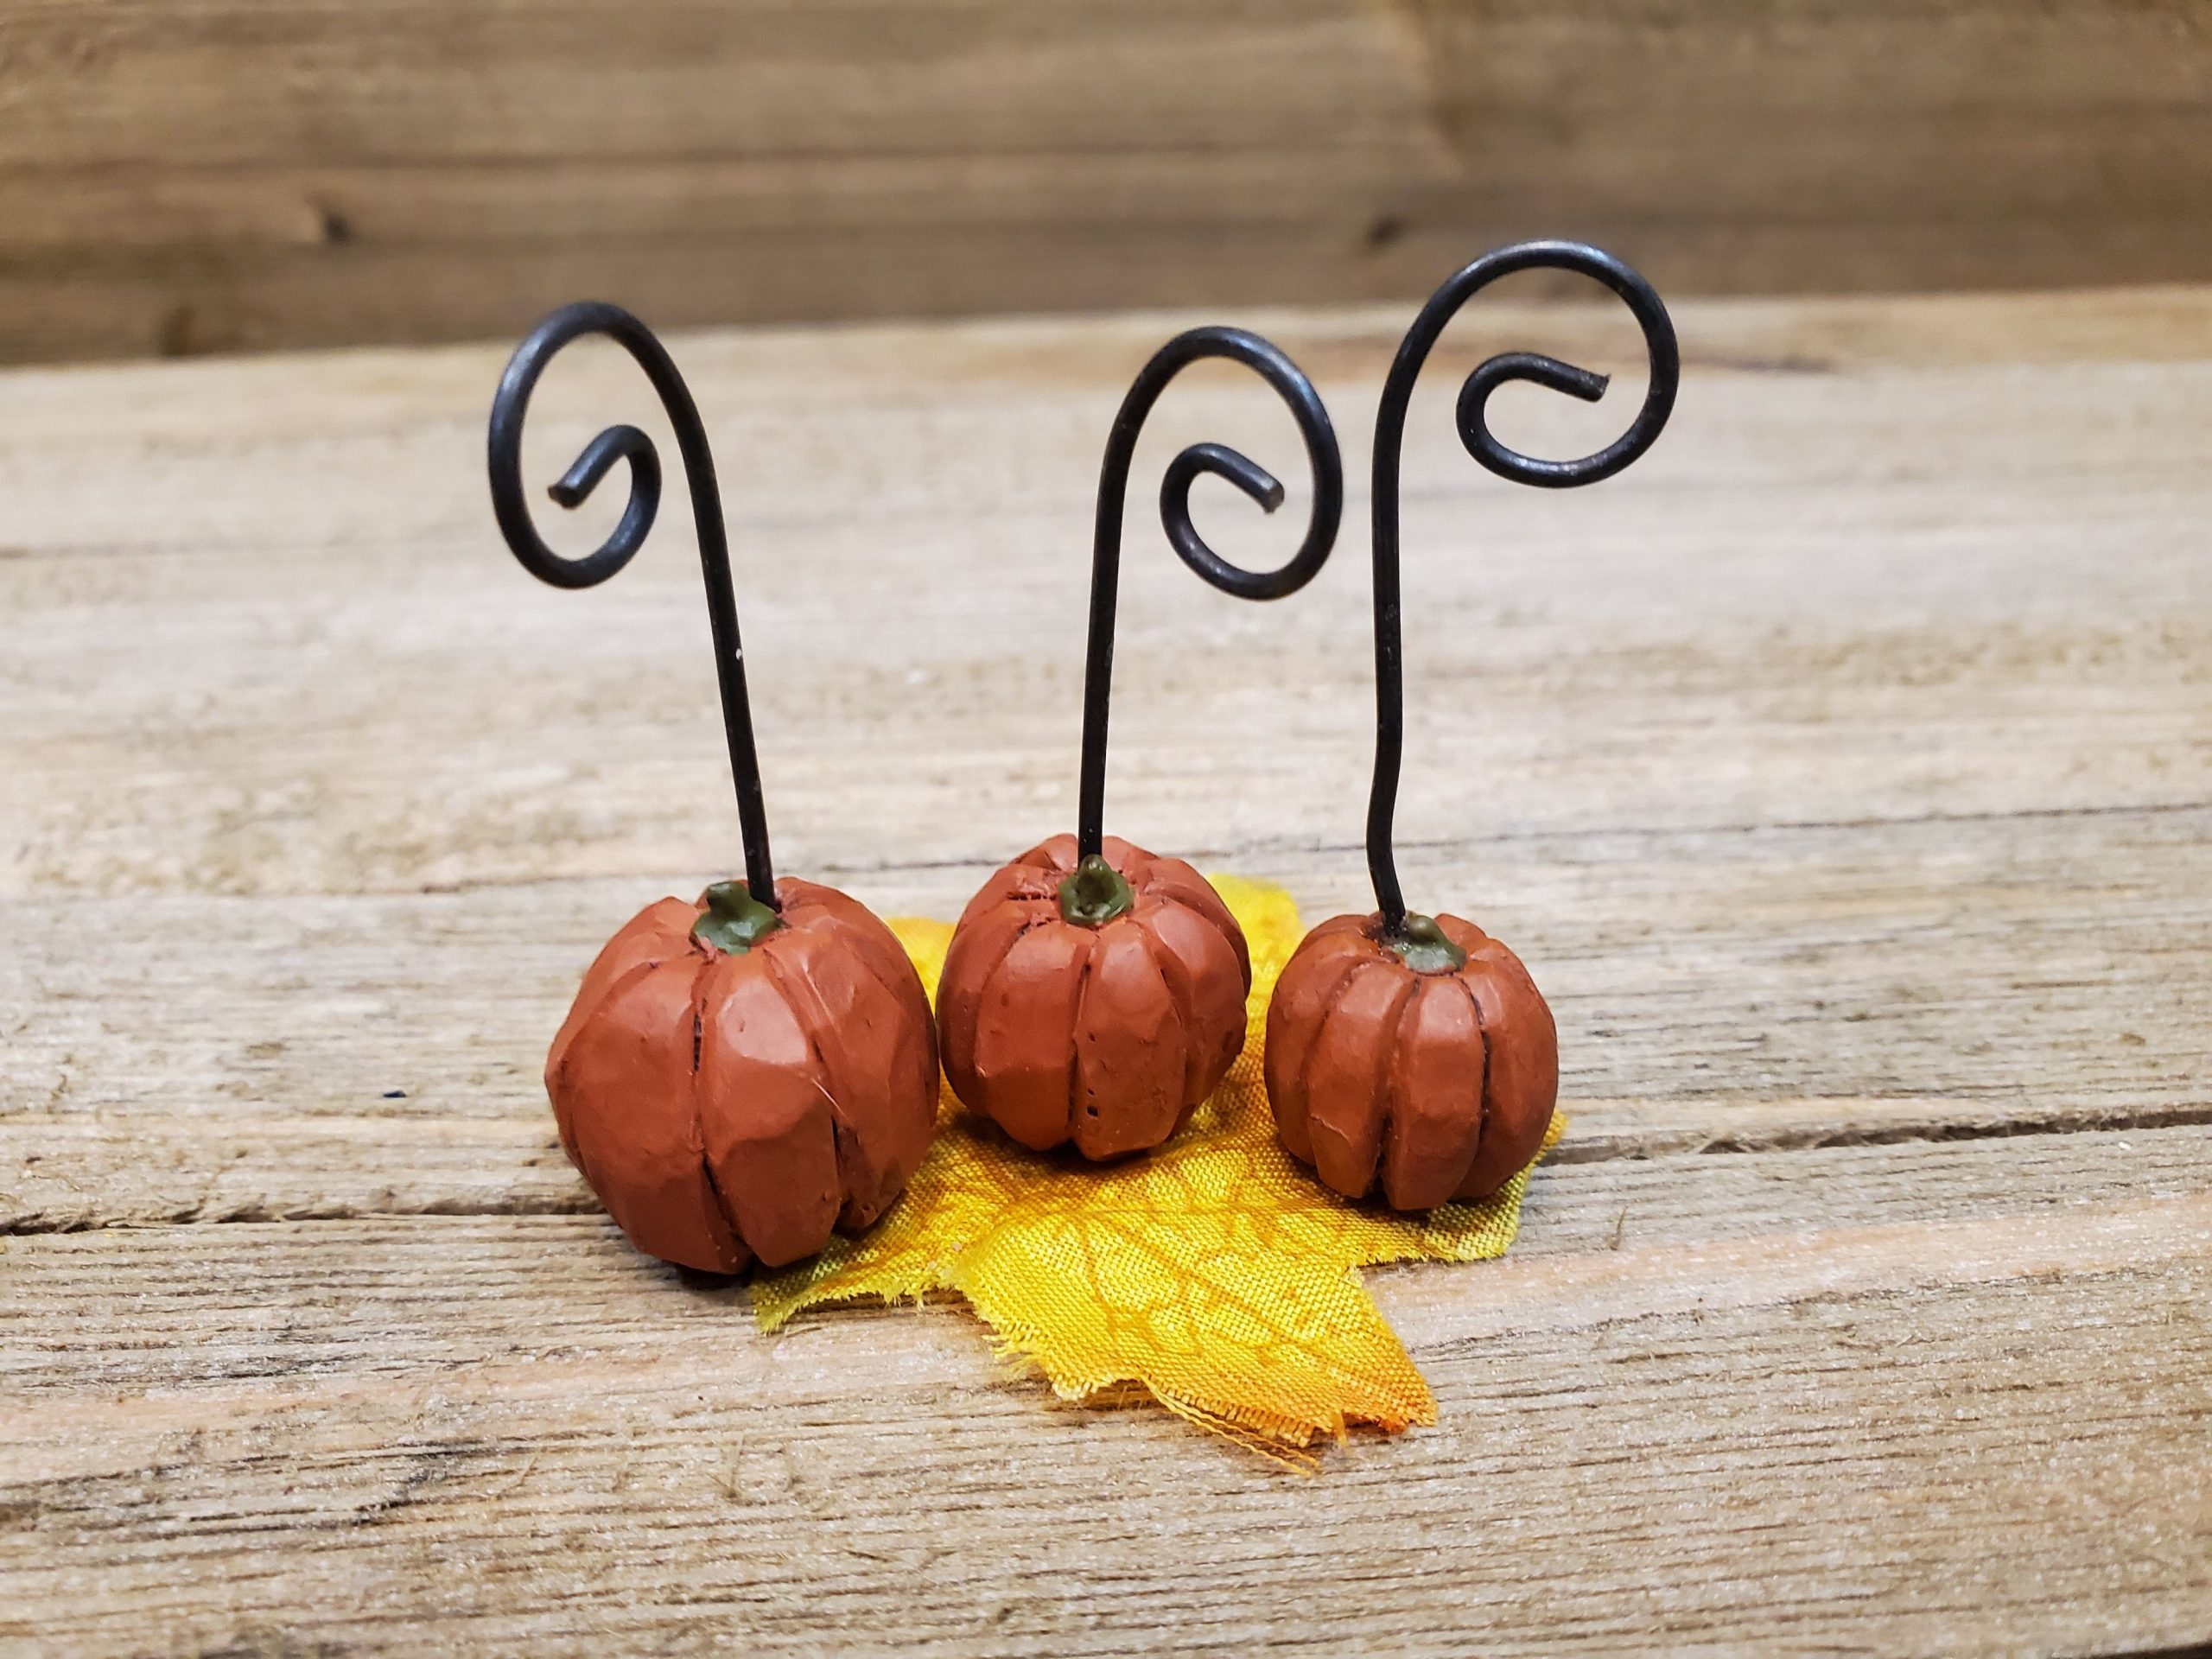 minature pumpkin blossom bucket